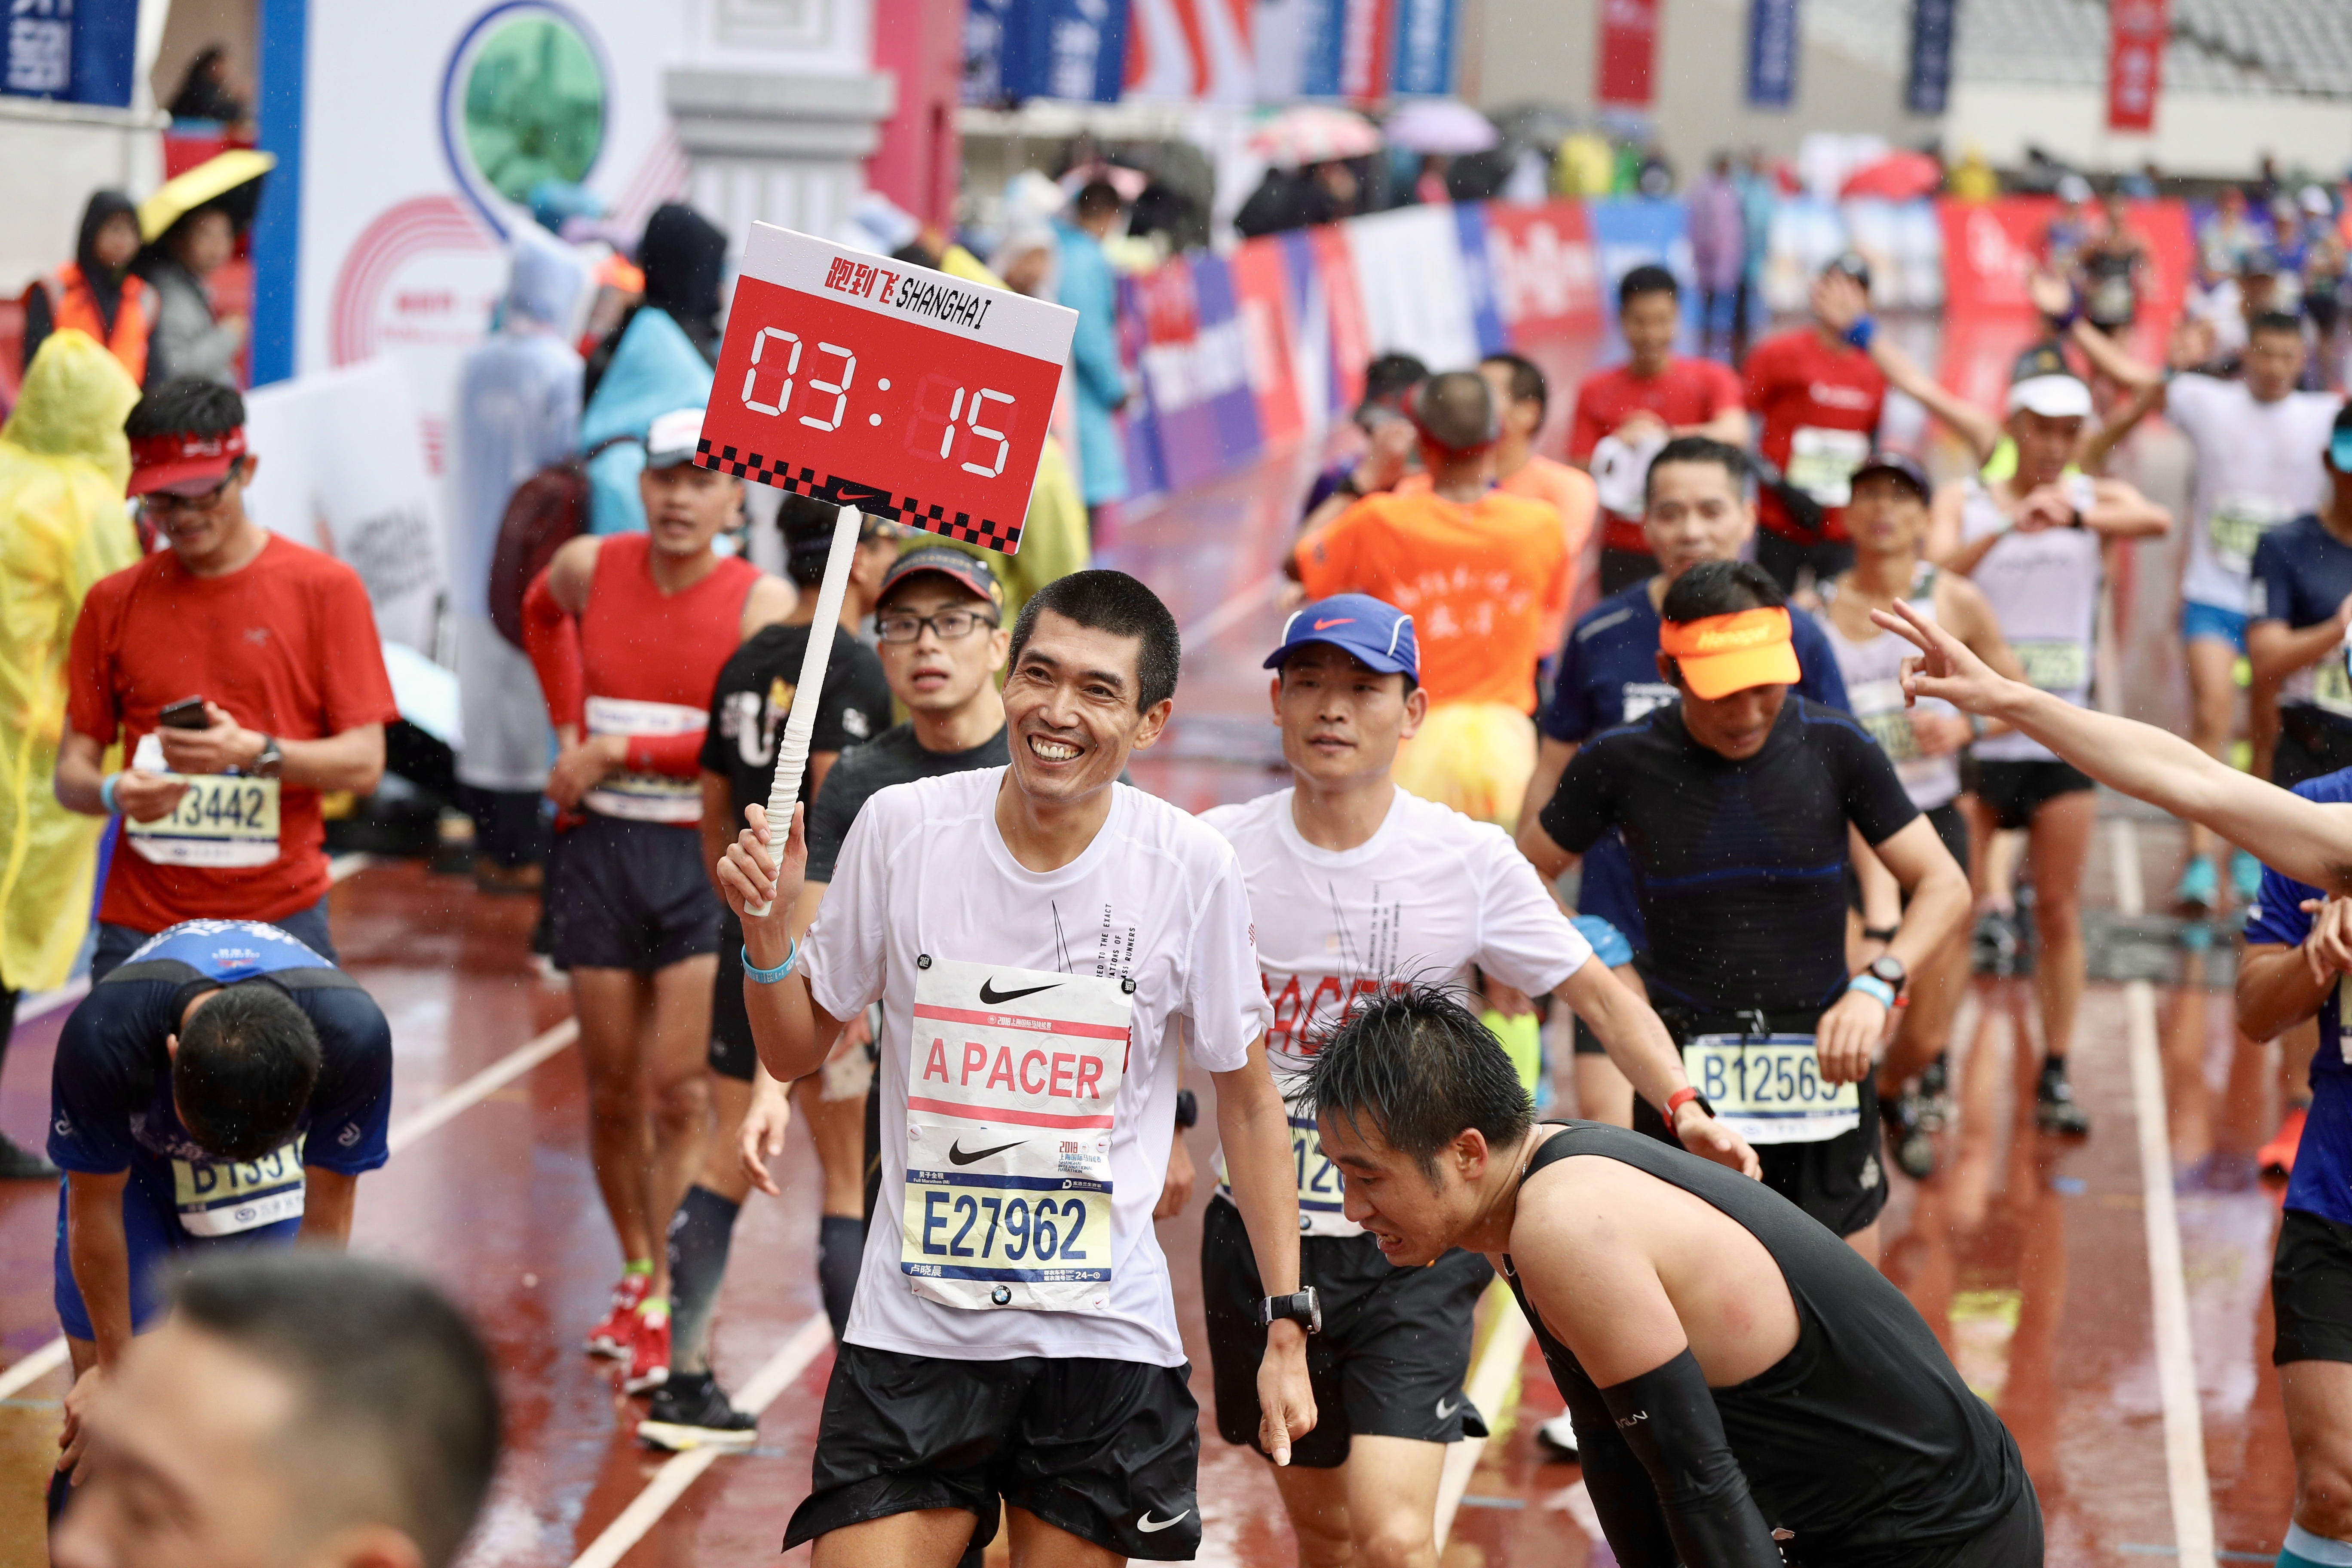 Ethiopian runner sets Shanghai women's marathon record